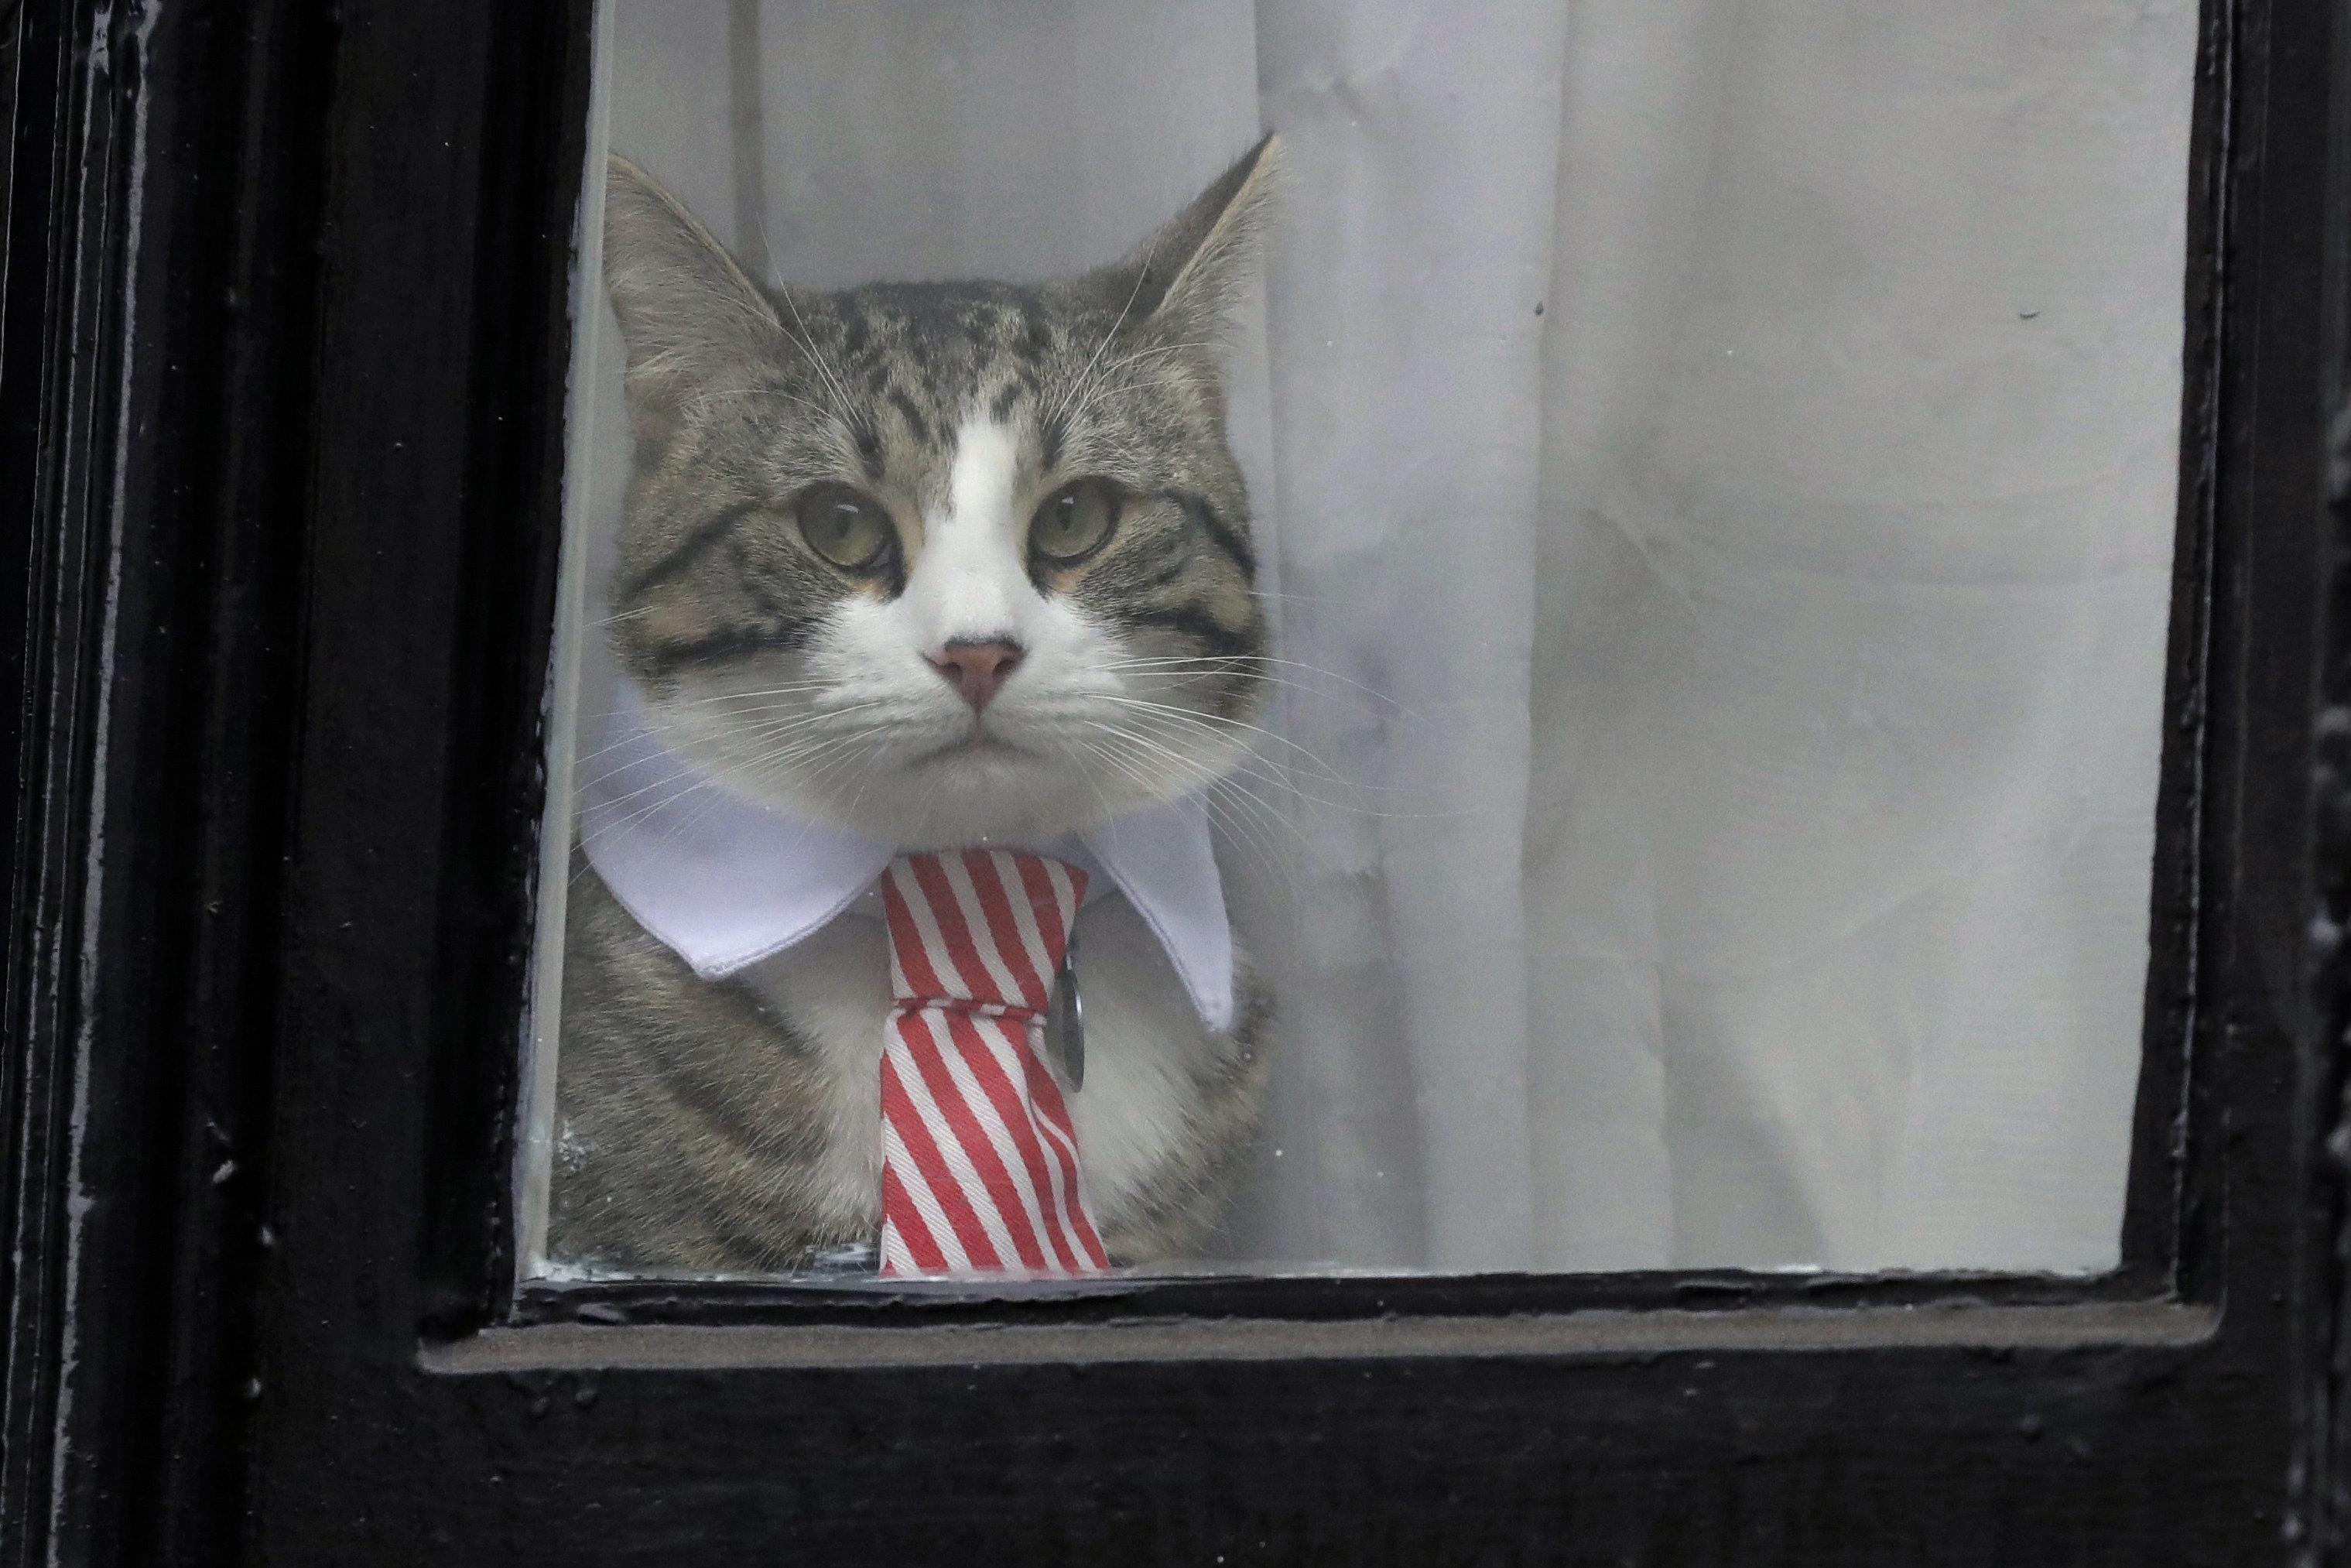 Julian Assange's Cat is Safe